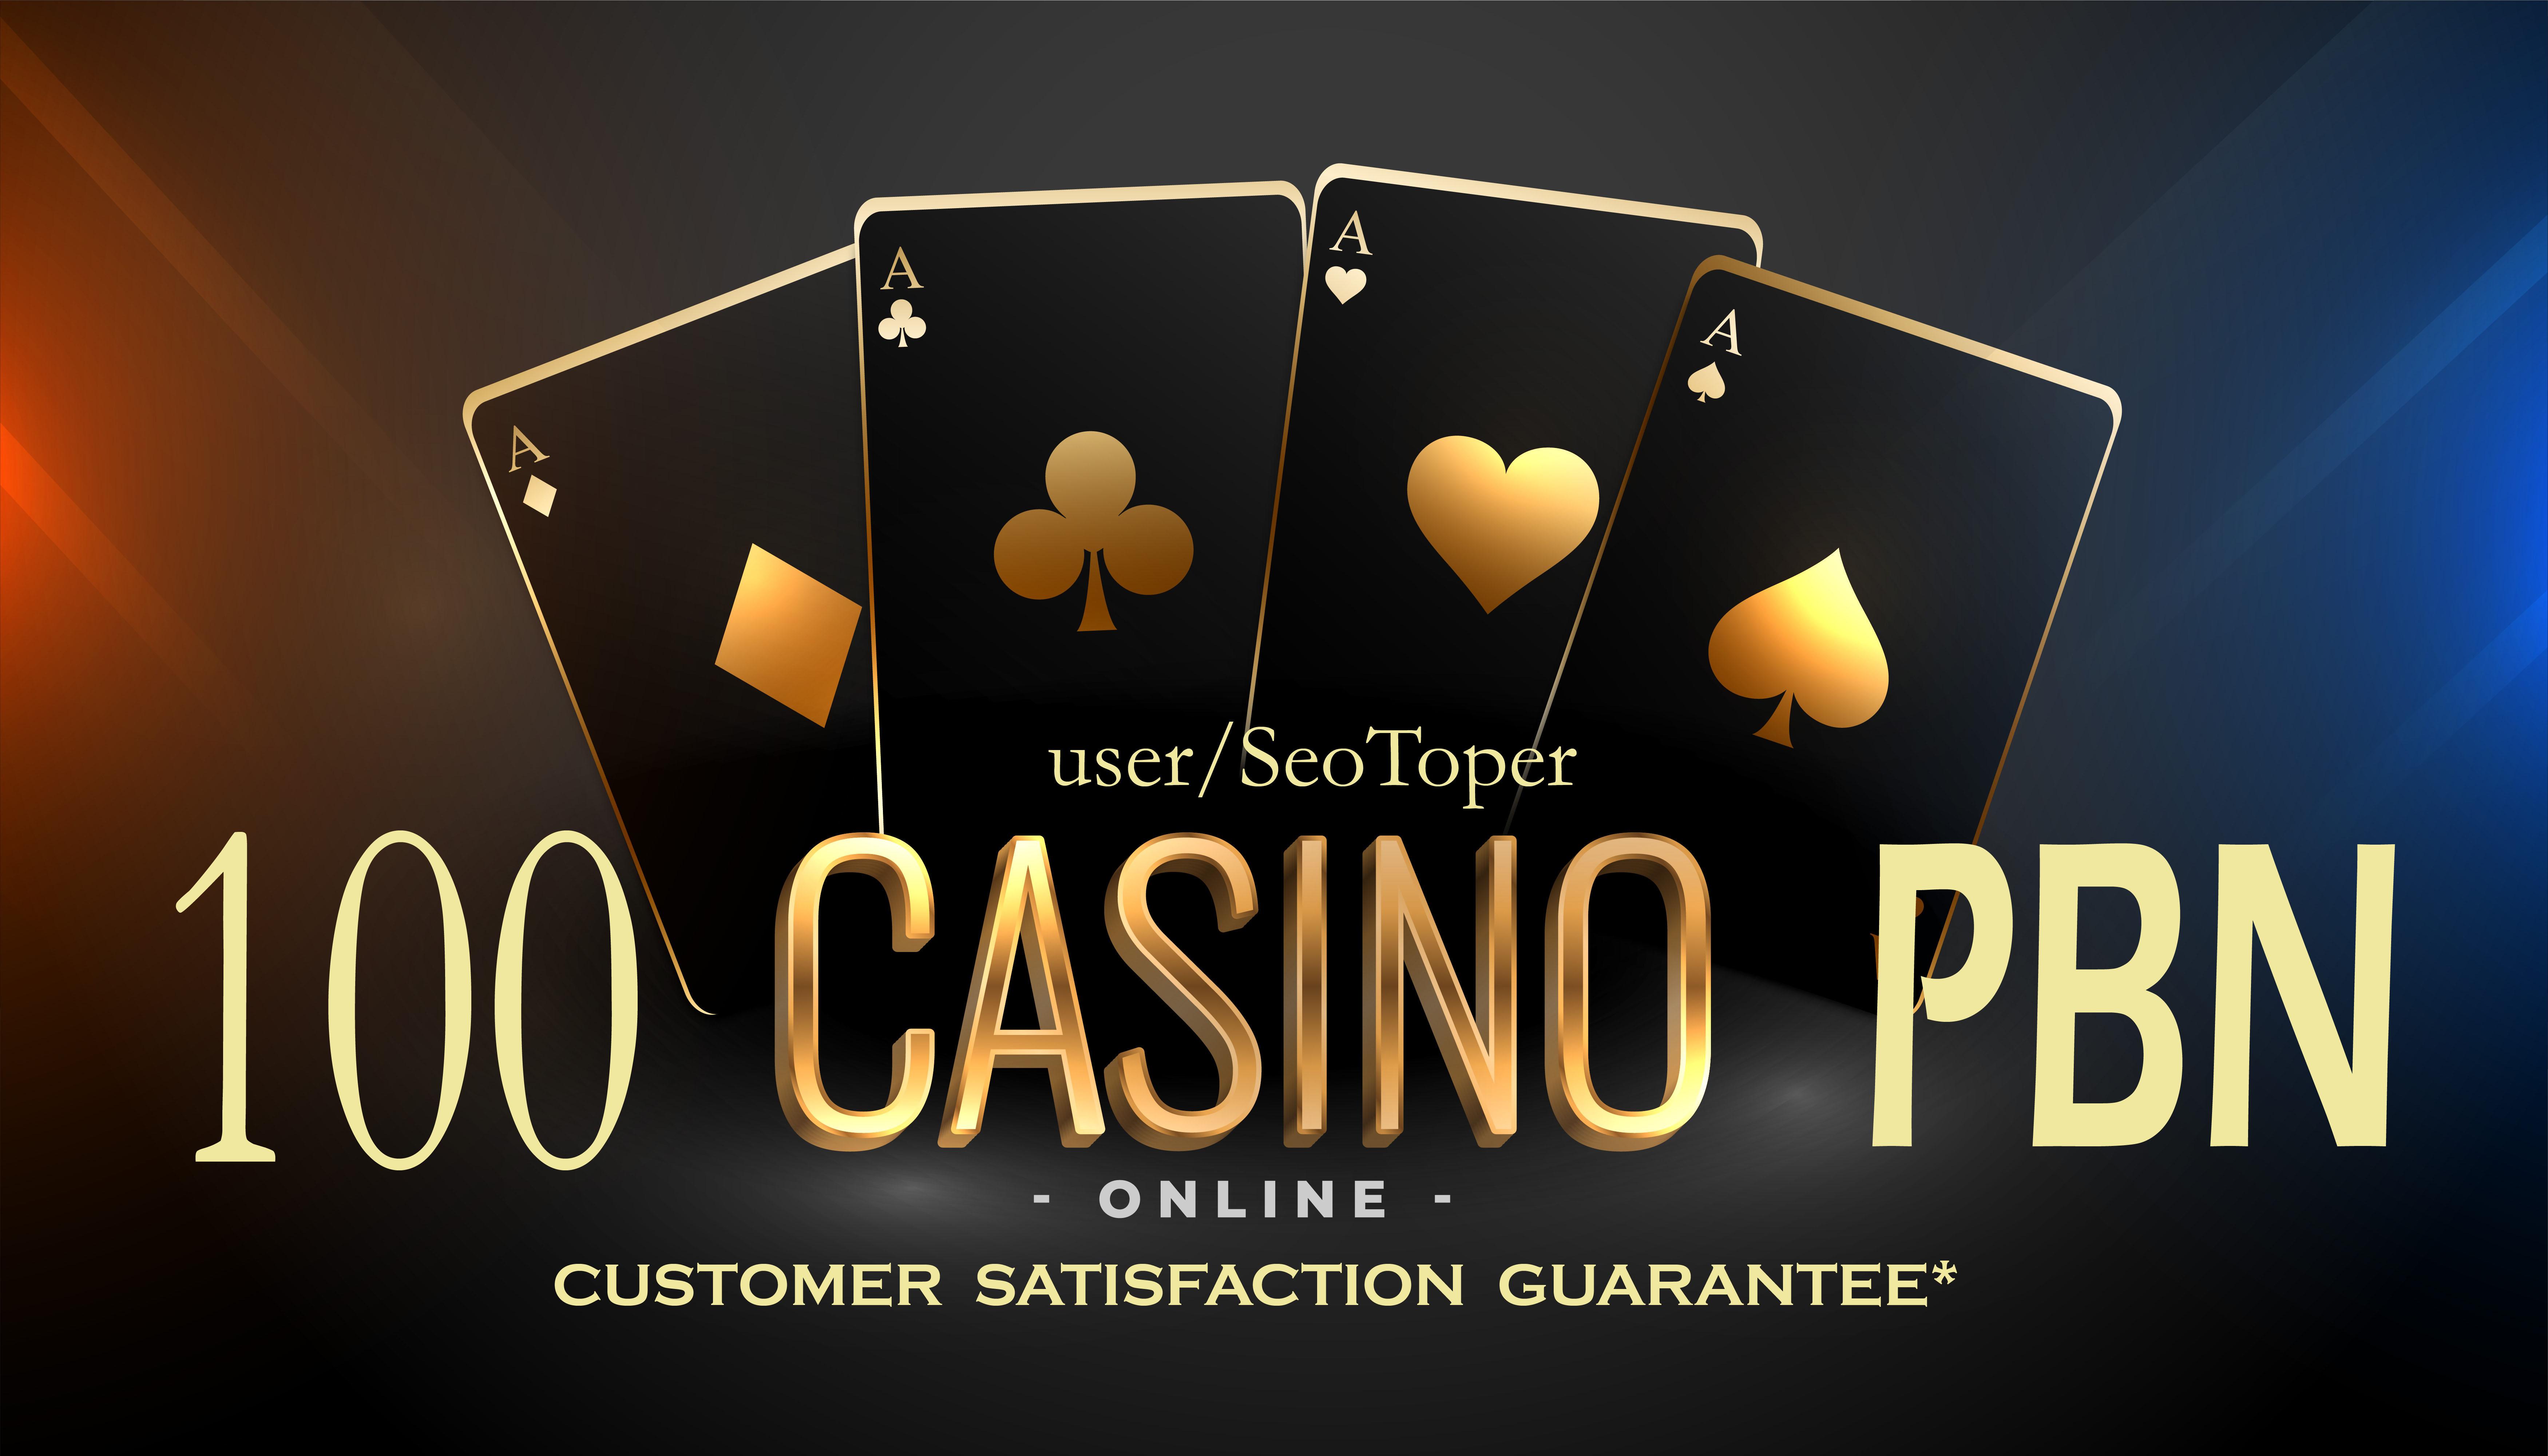 2021 Latest Buy 3 Get 1 free 100 CASINO,  GAMBLING,  POKER related high quality pbn backlinks